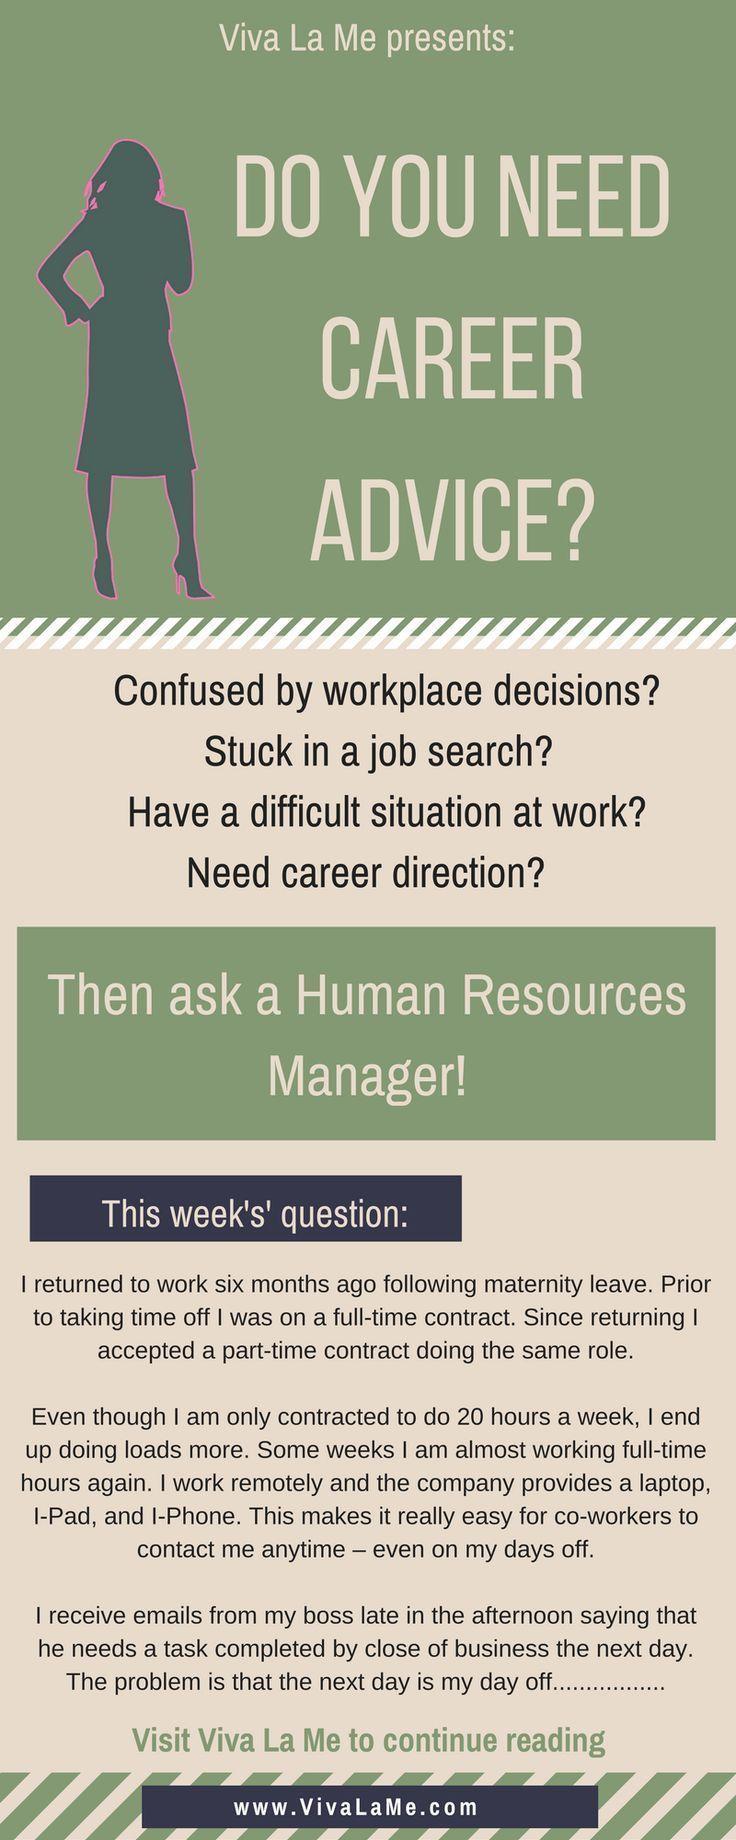 career advice career help job search resumes job interview human resources